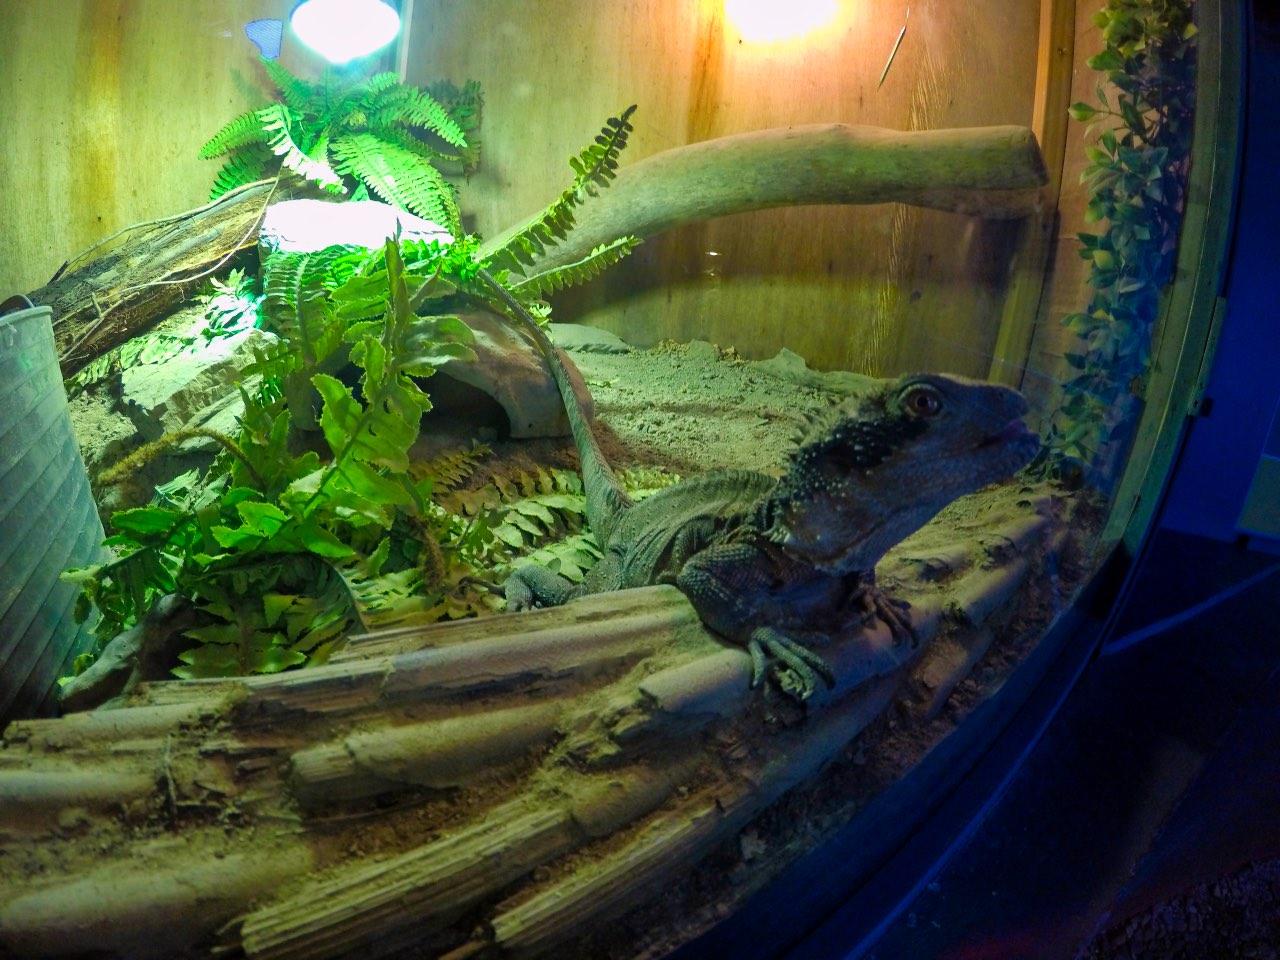 Picton-Aquarium-ew-Zealand-GoPro-Hero-5